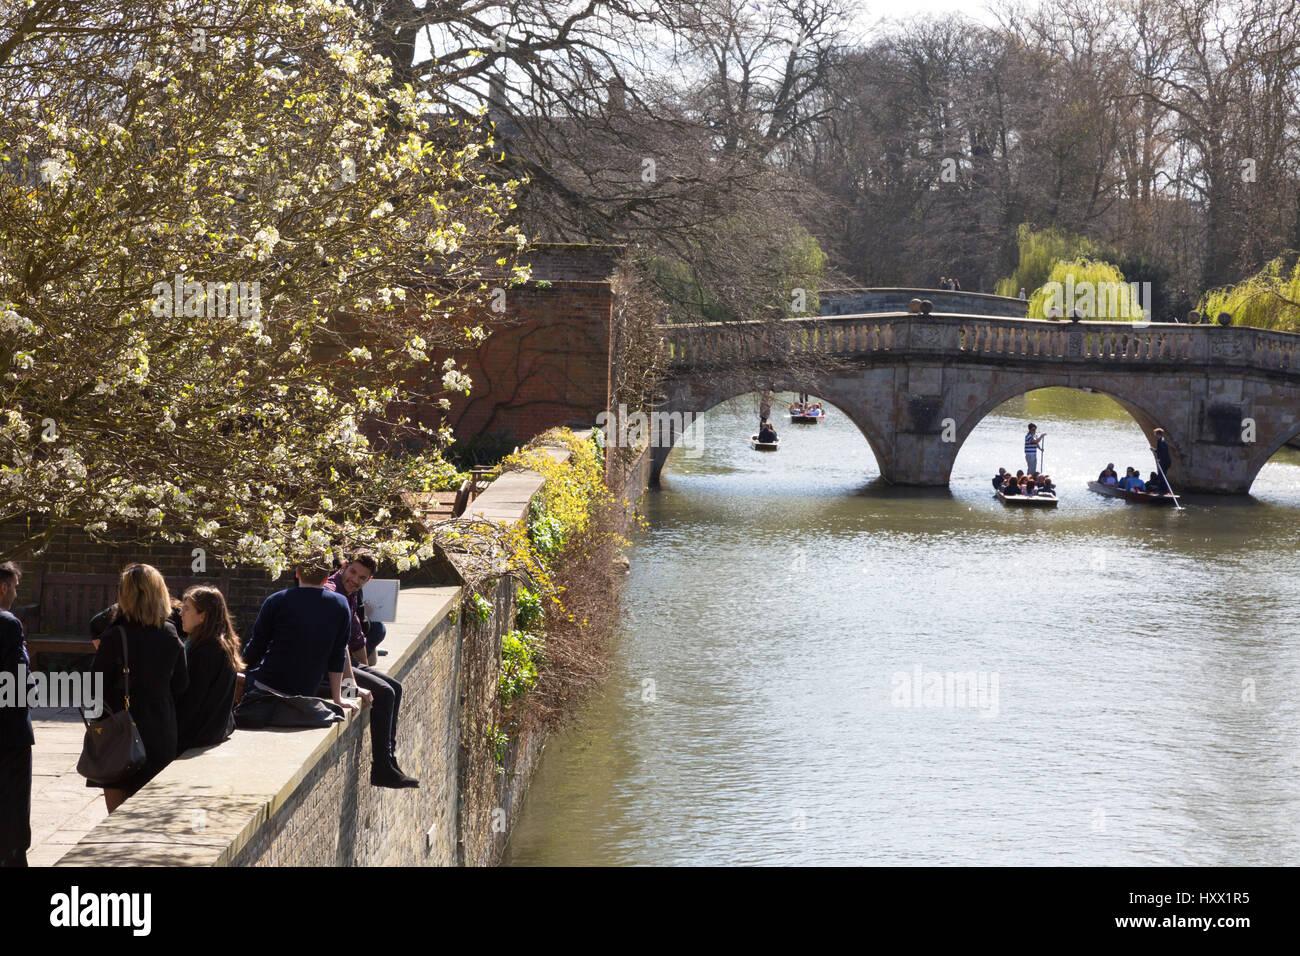 Cambridge UK - Cambridge punting on the River Cam in spring at Clare Bridge, Cambridge England - Stock Image